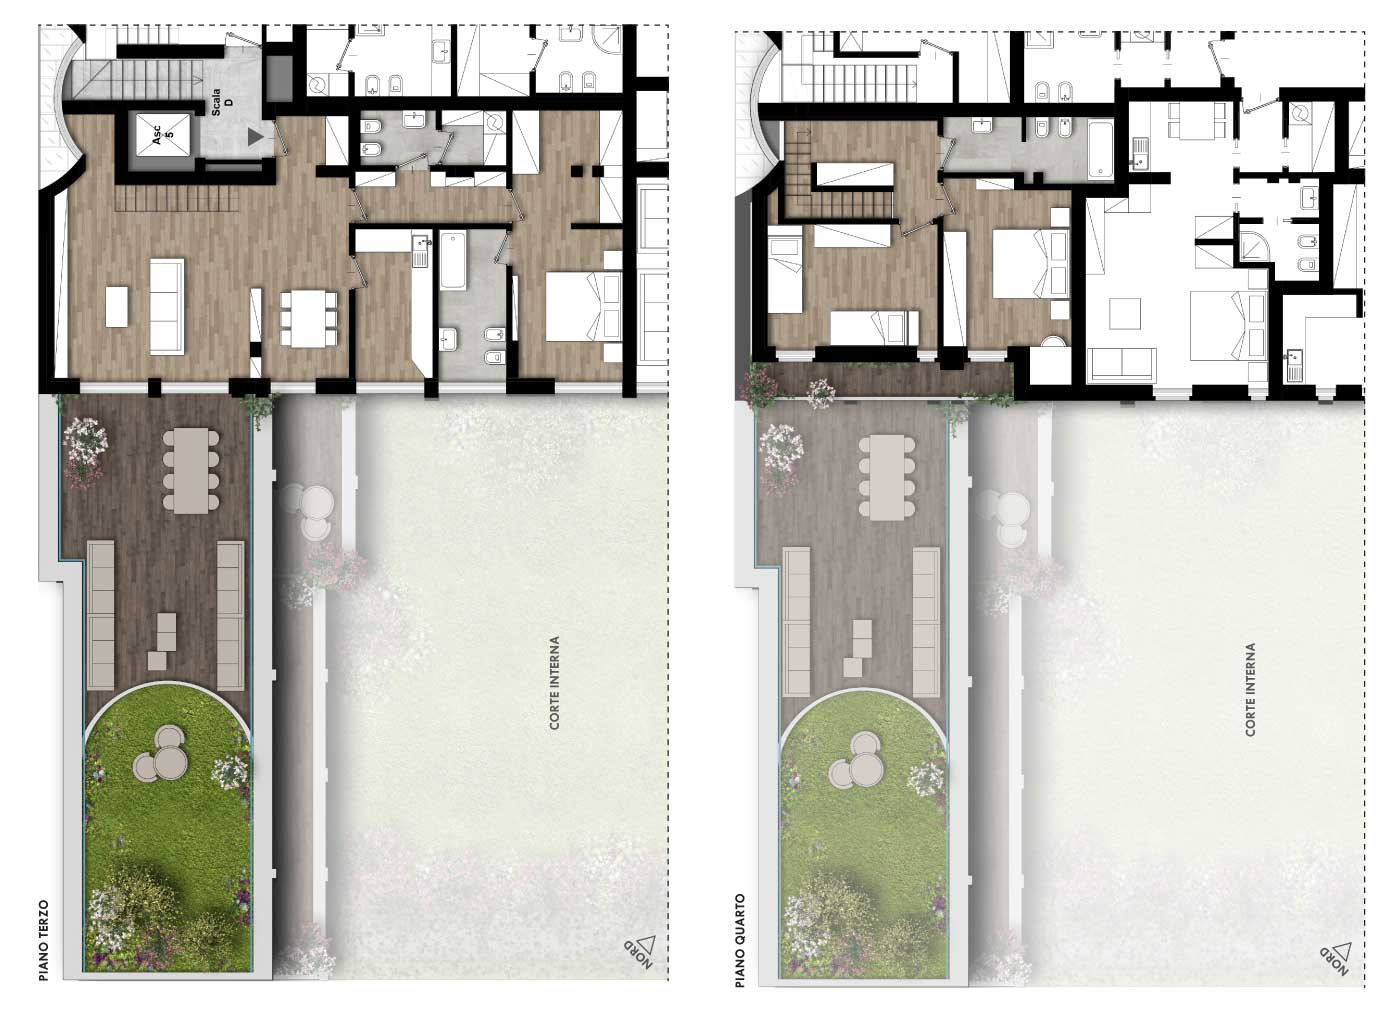 Plurilocali leopardi 15 for Planimetrie architettoniche